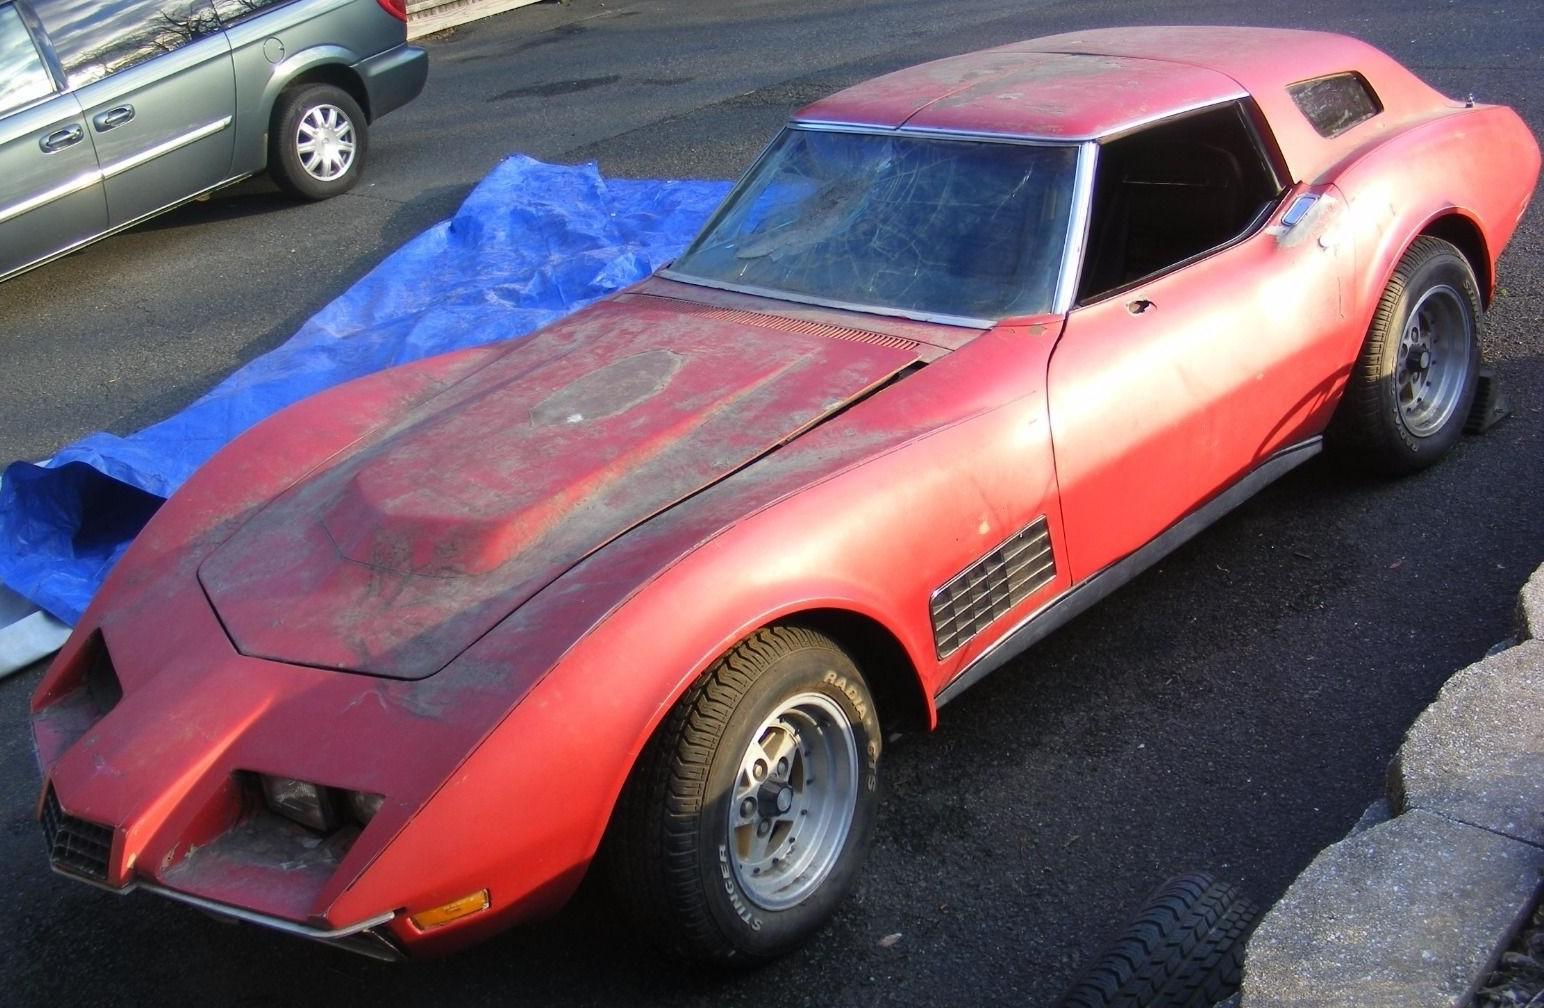 1999 Corvette For Sale >> Ontario Breadvan: 1972 Chevy Corvette